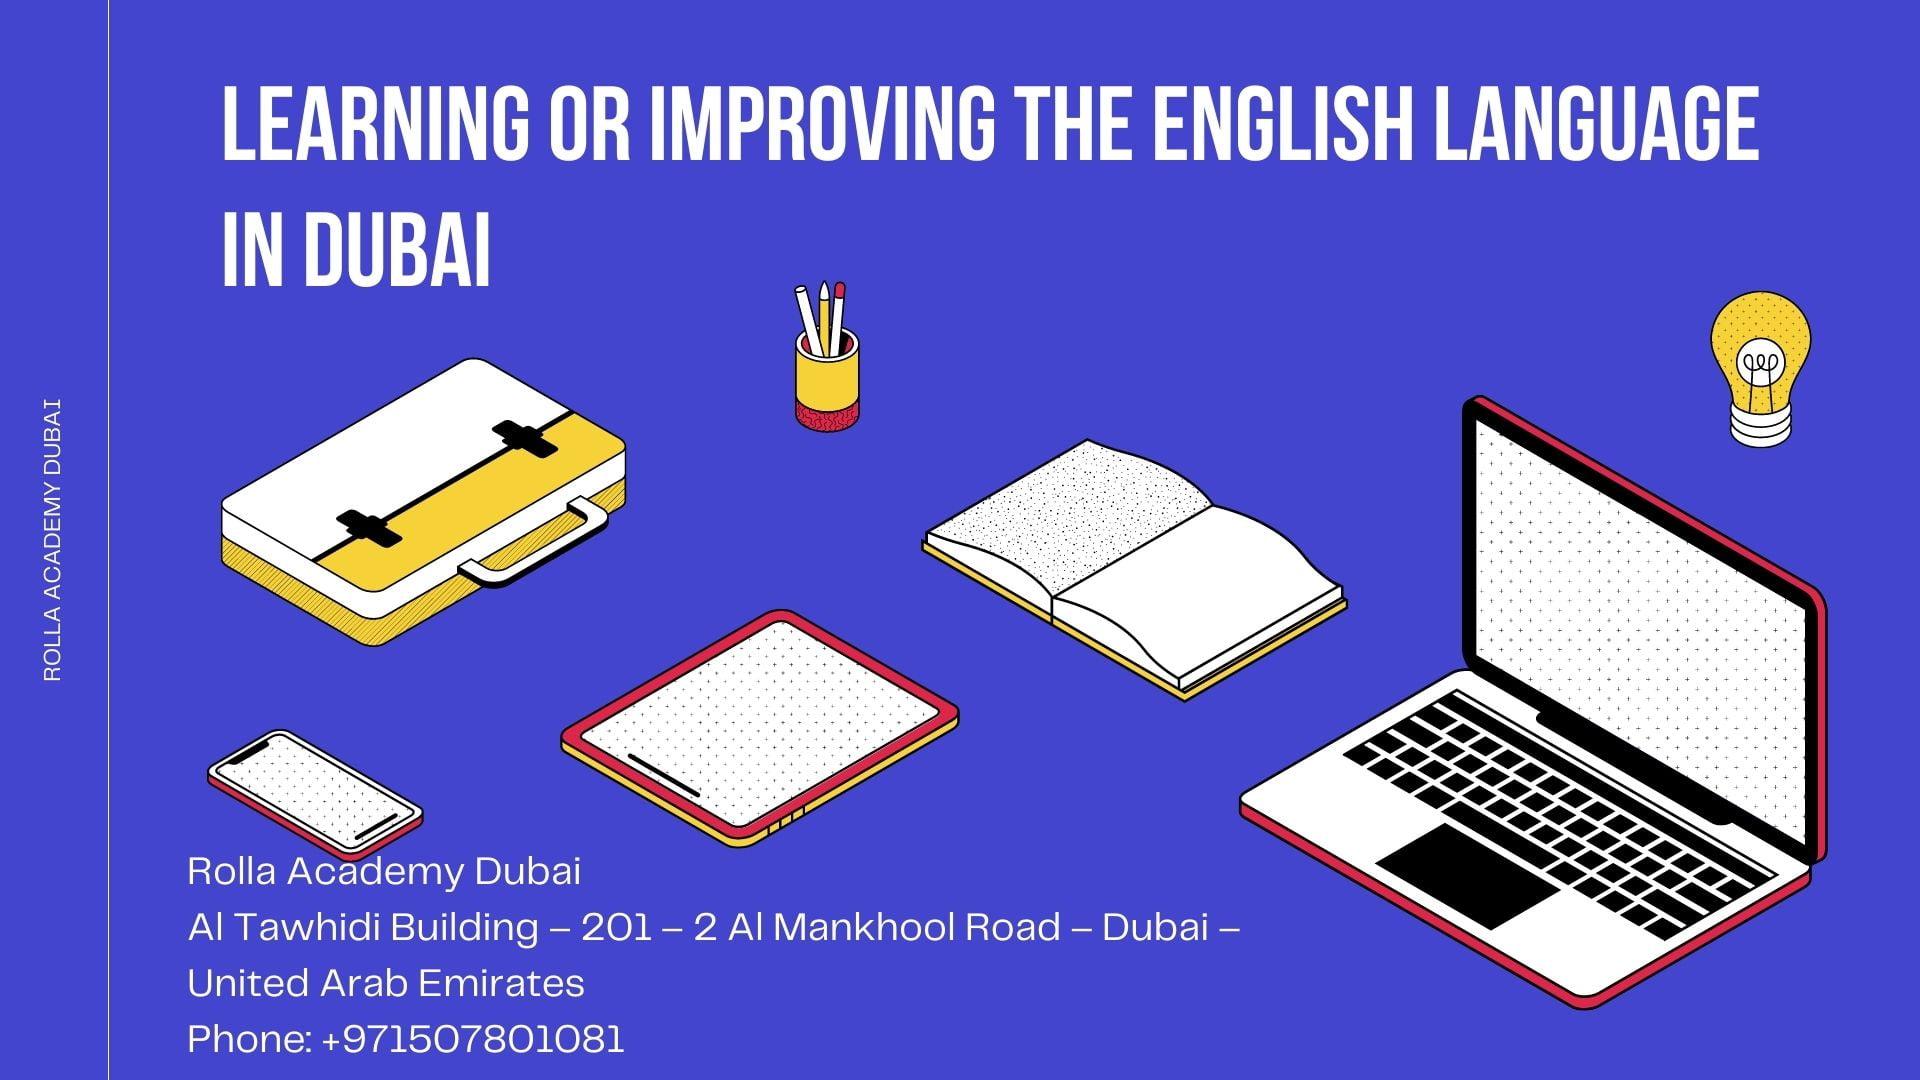 Learning or Improving the English Language in Dubai